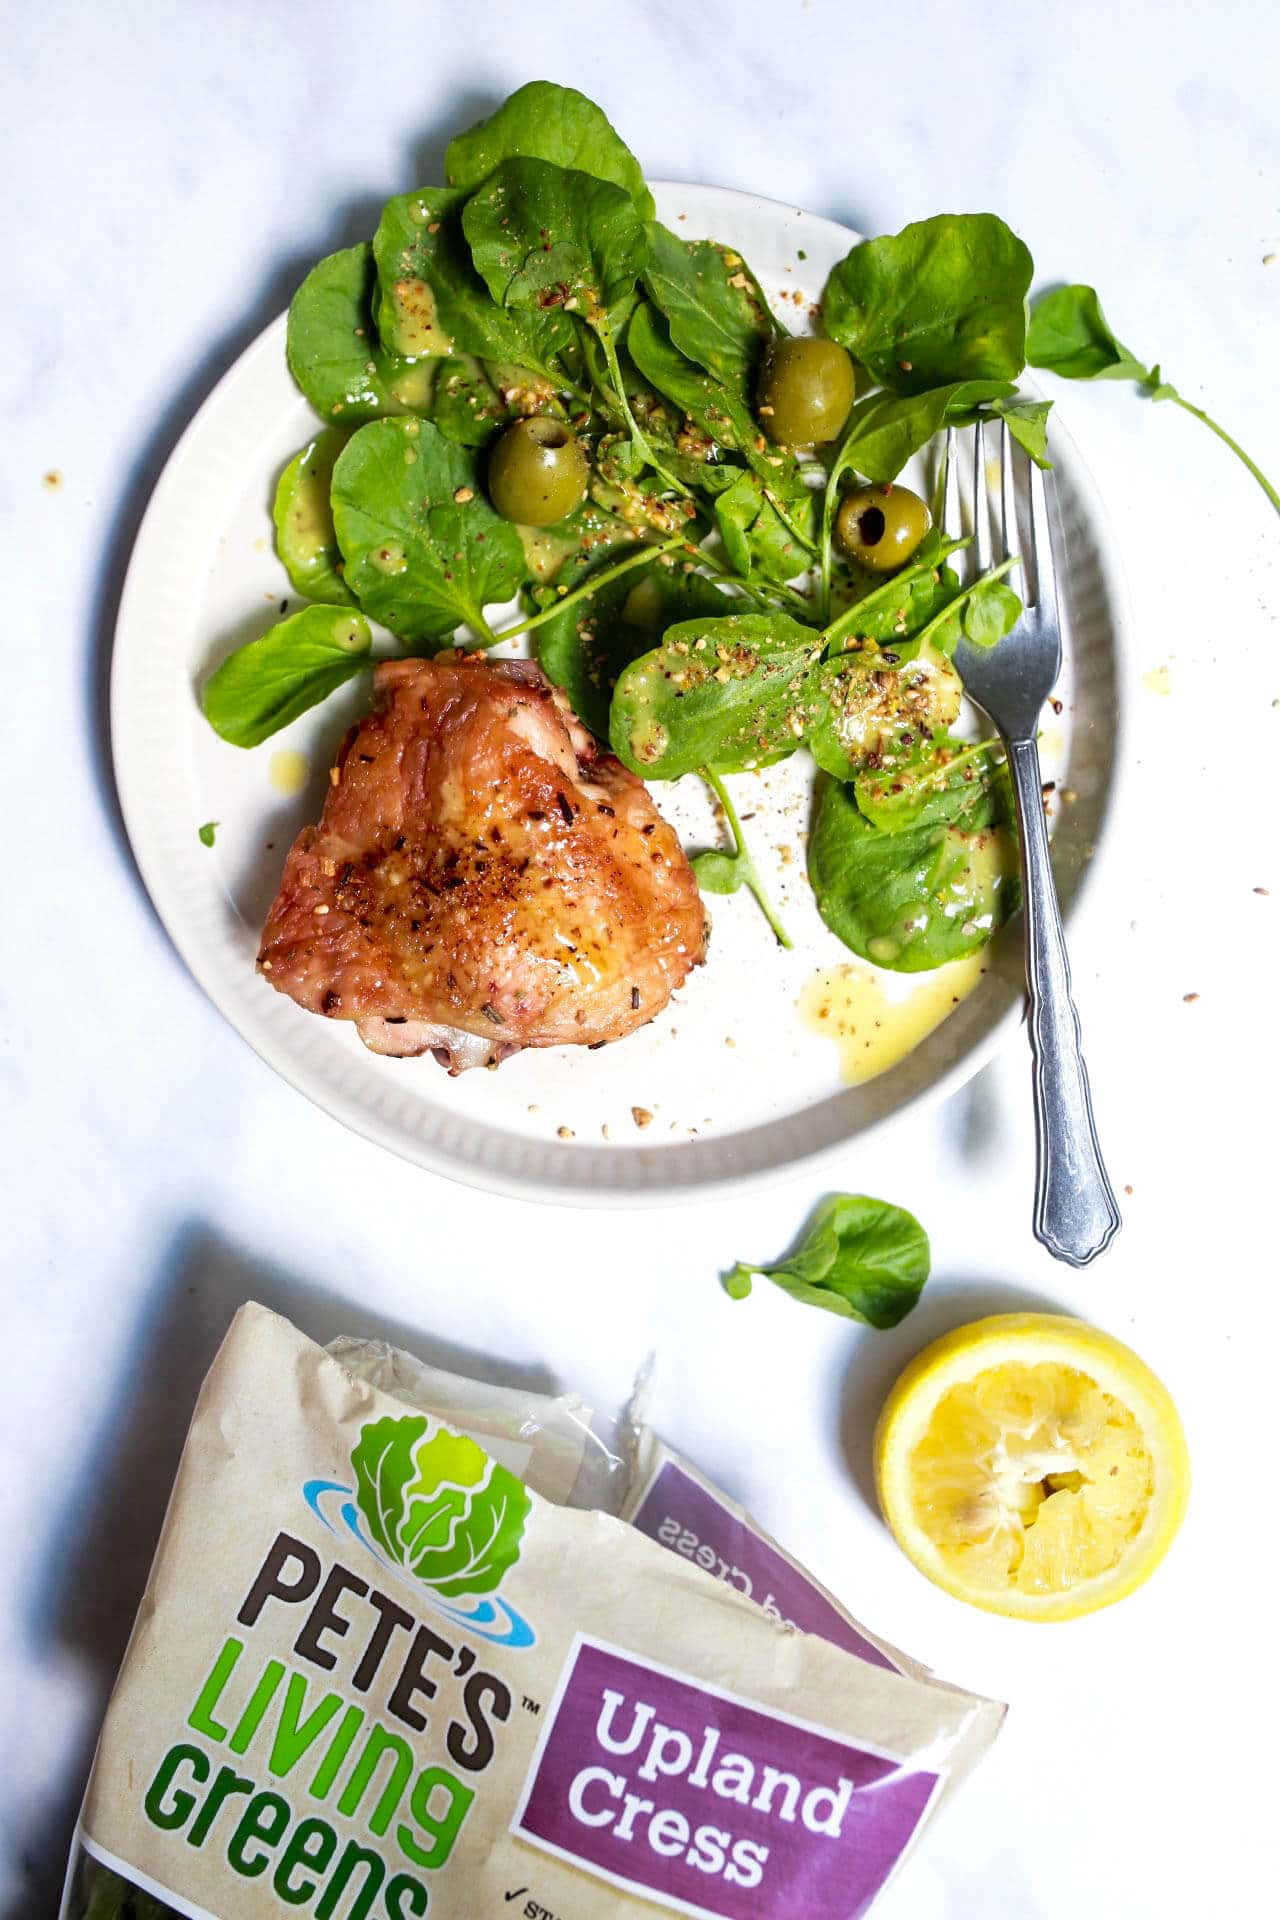 How To Make Watercress Salad with Lemon Vinaigrette recipe